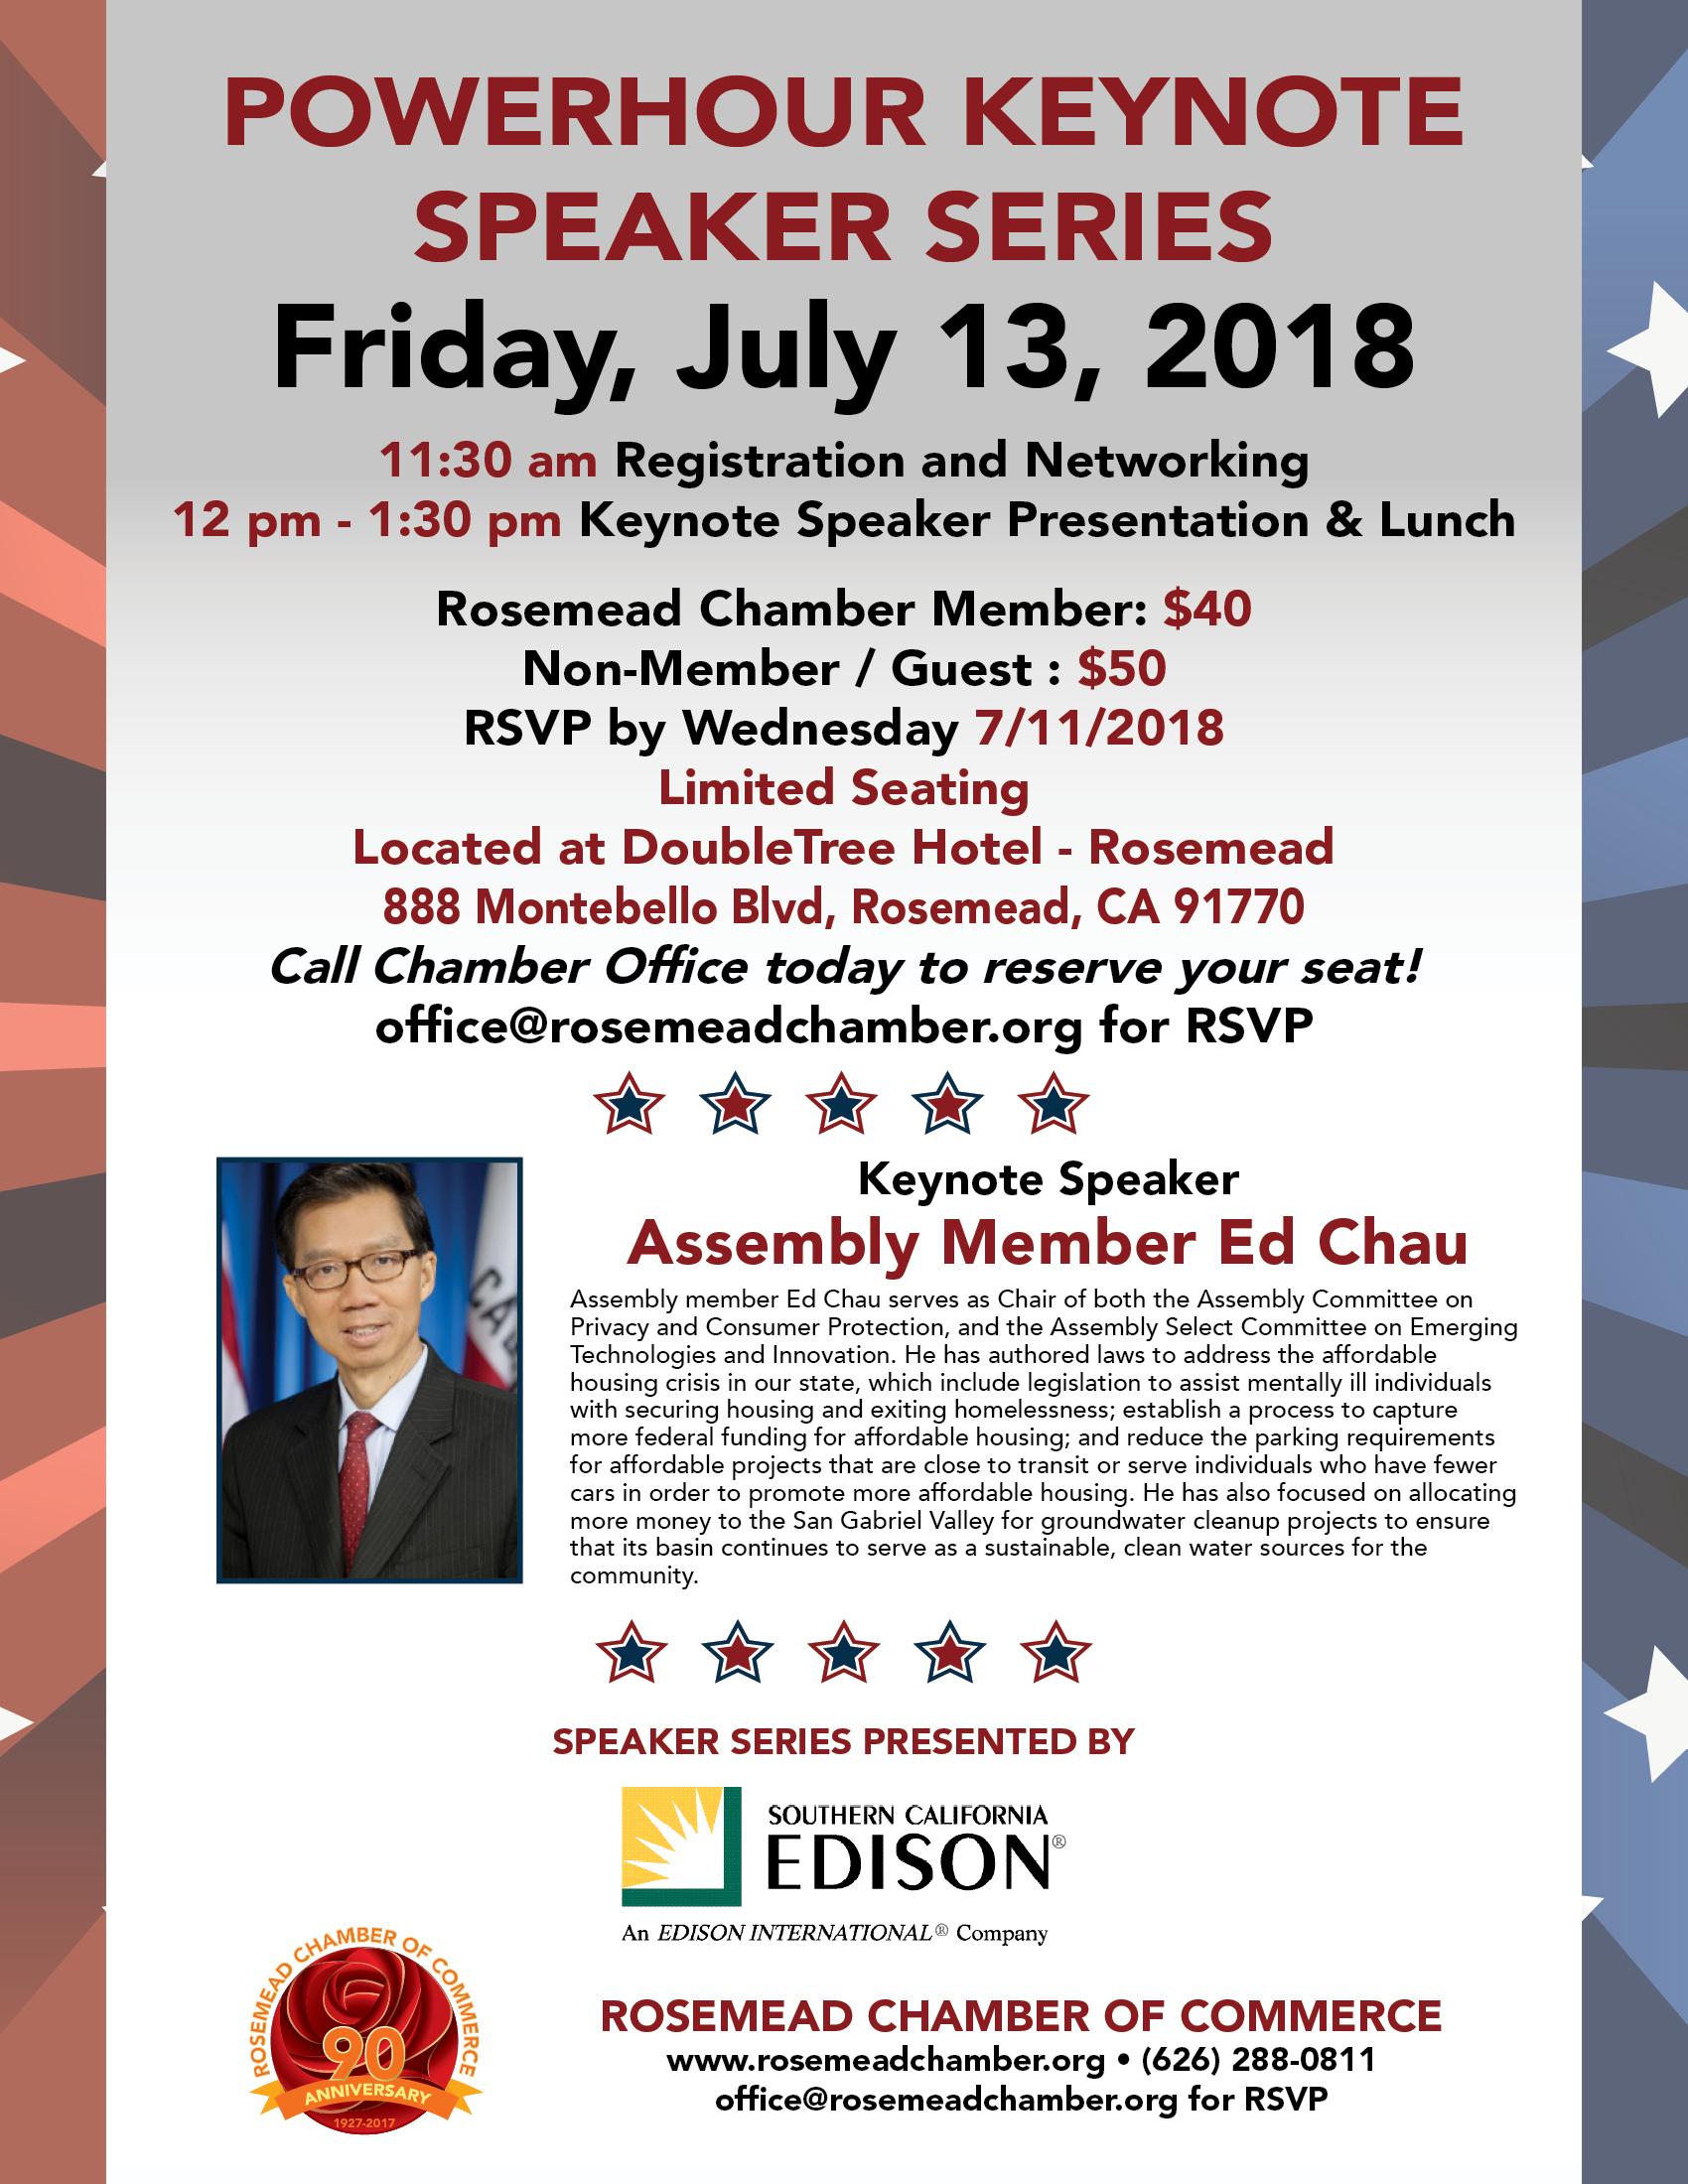 Powerhouse keynote speaker series - Friday, July 13th, 2018